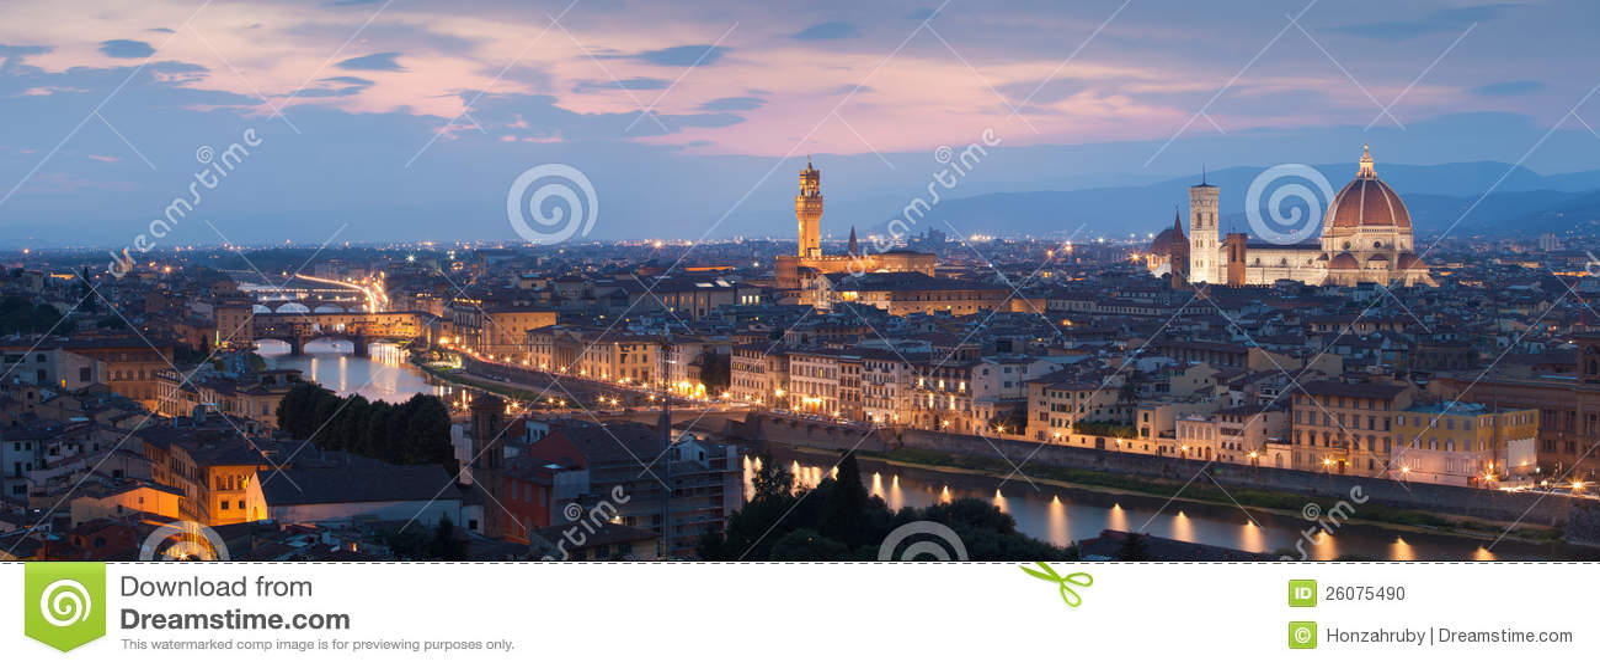 Панорама Флоренс